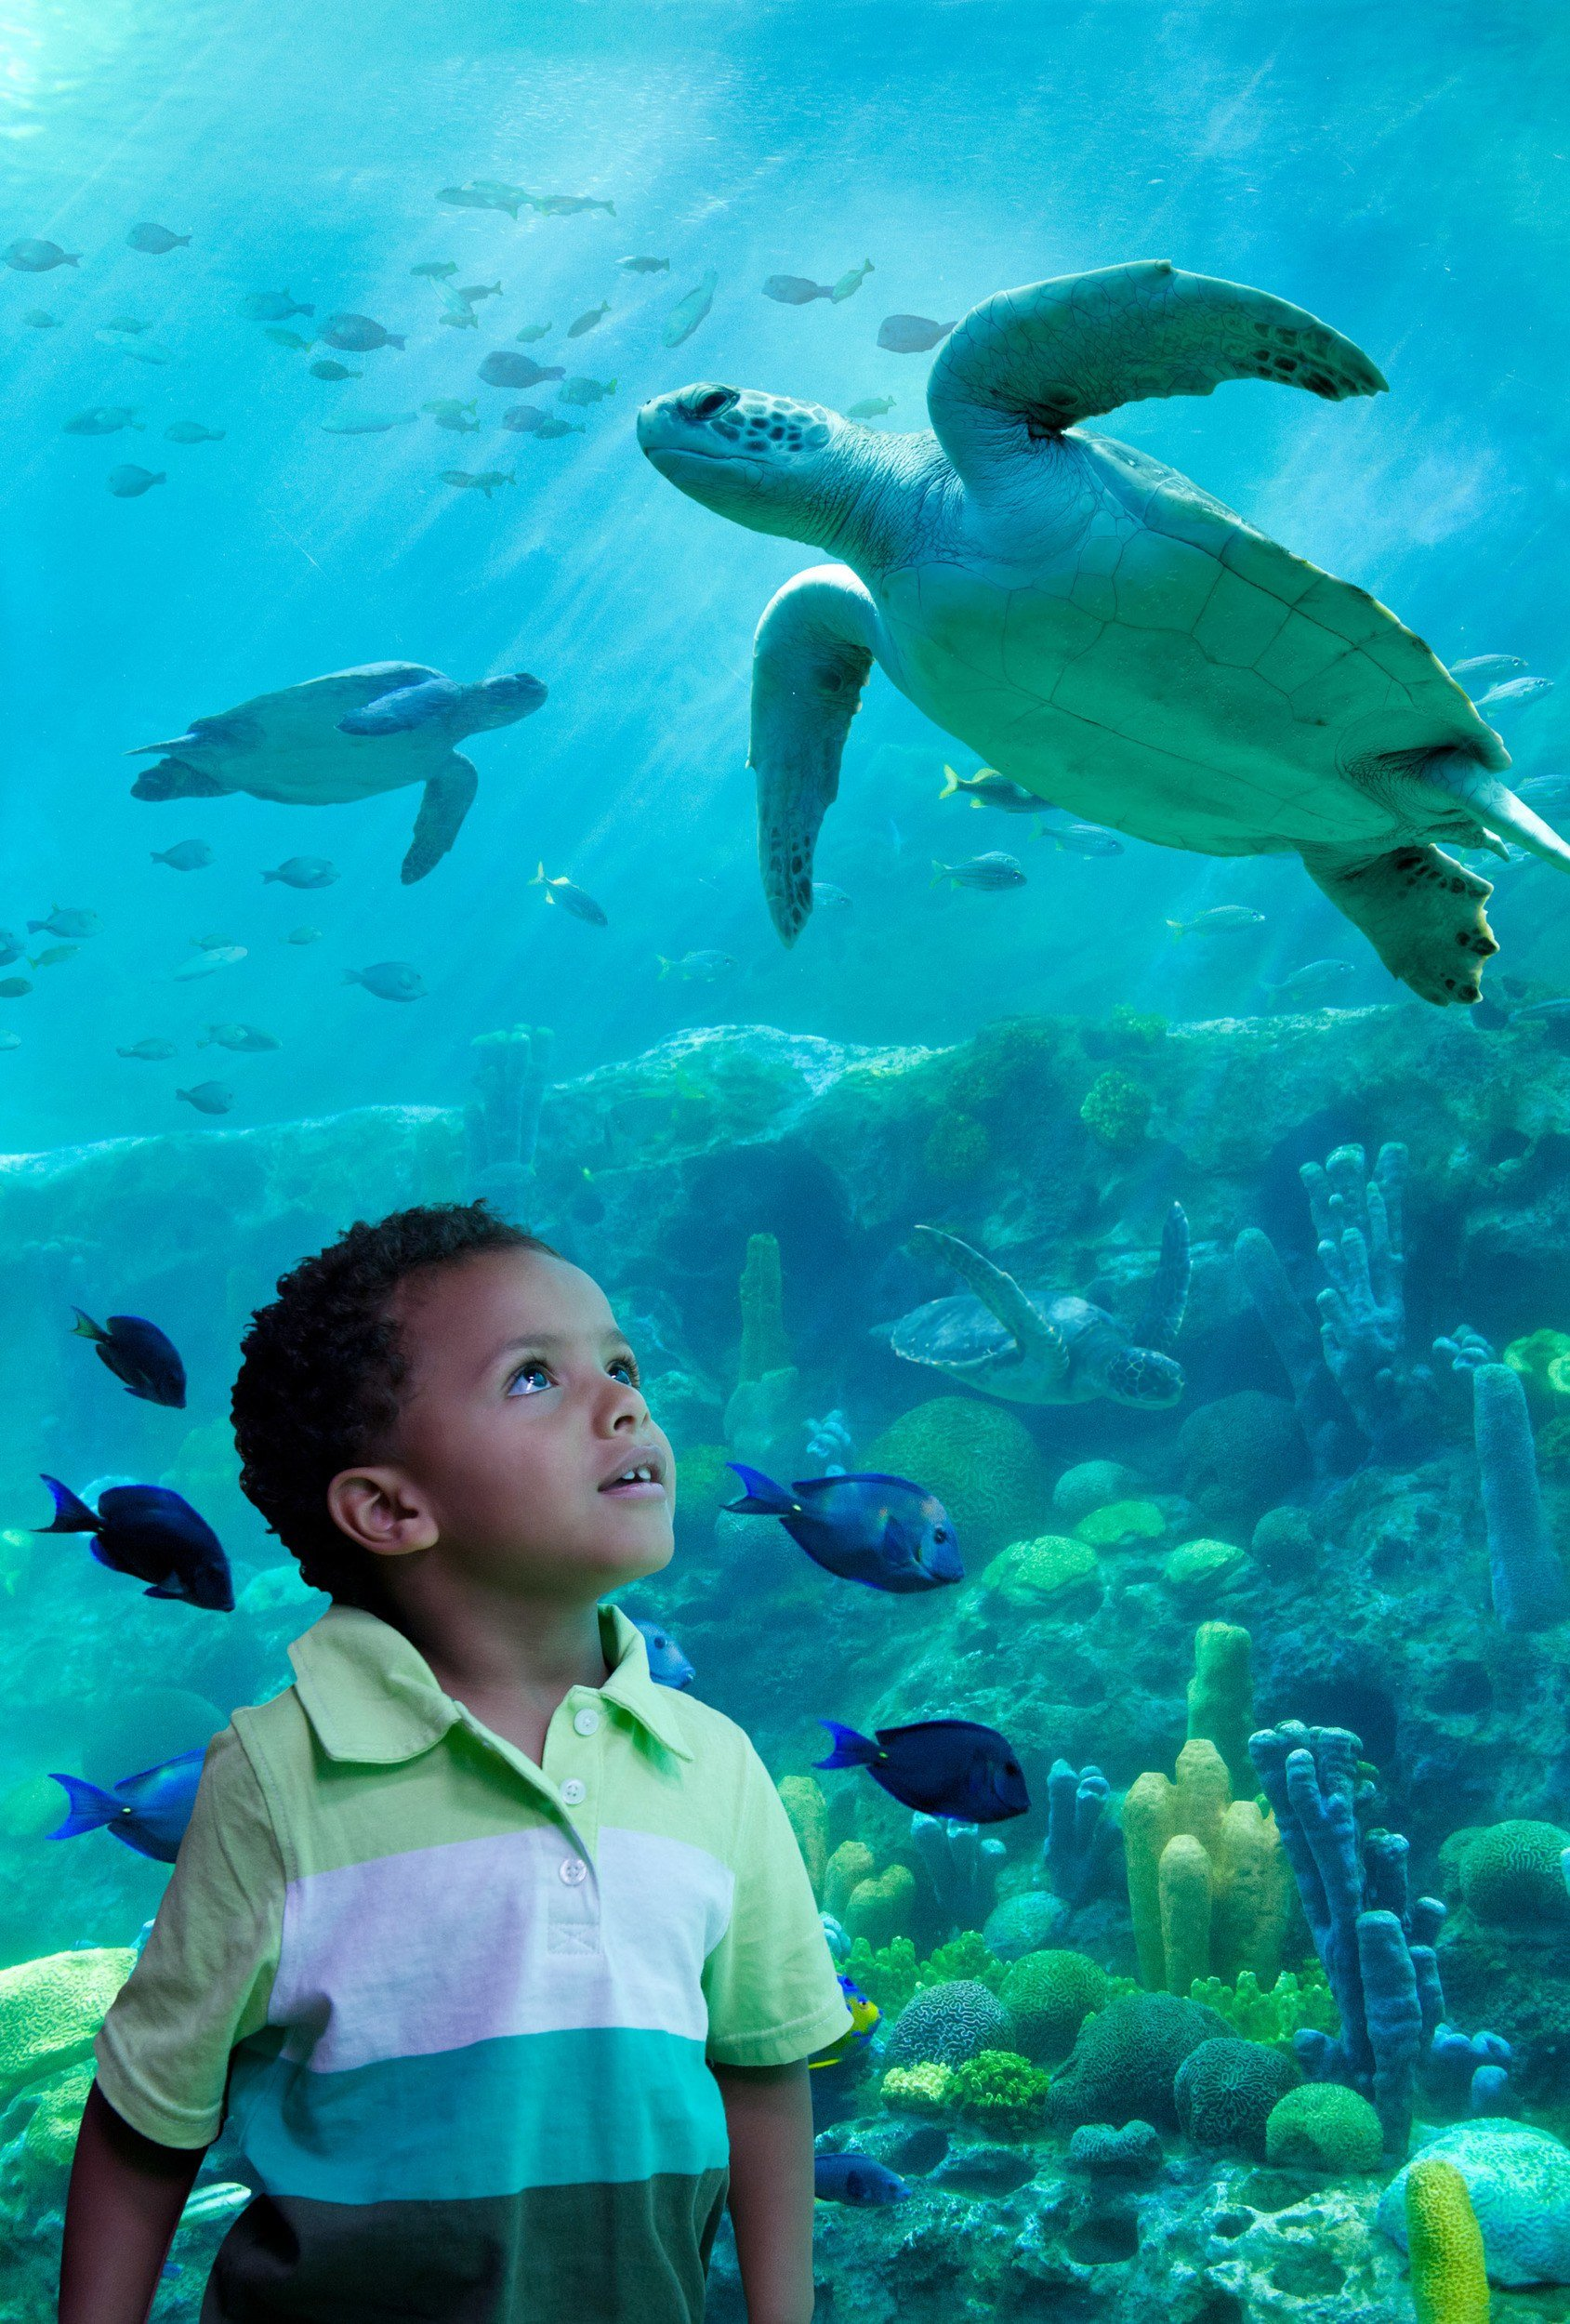 Young child at SeaWorld Orlando